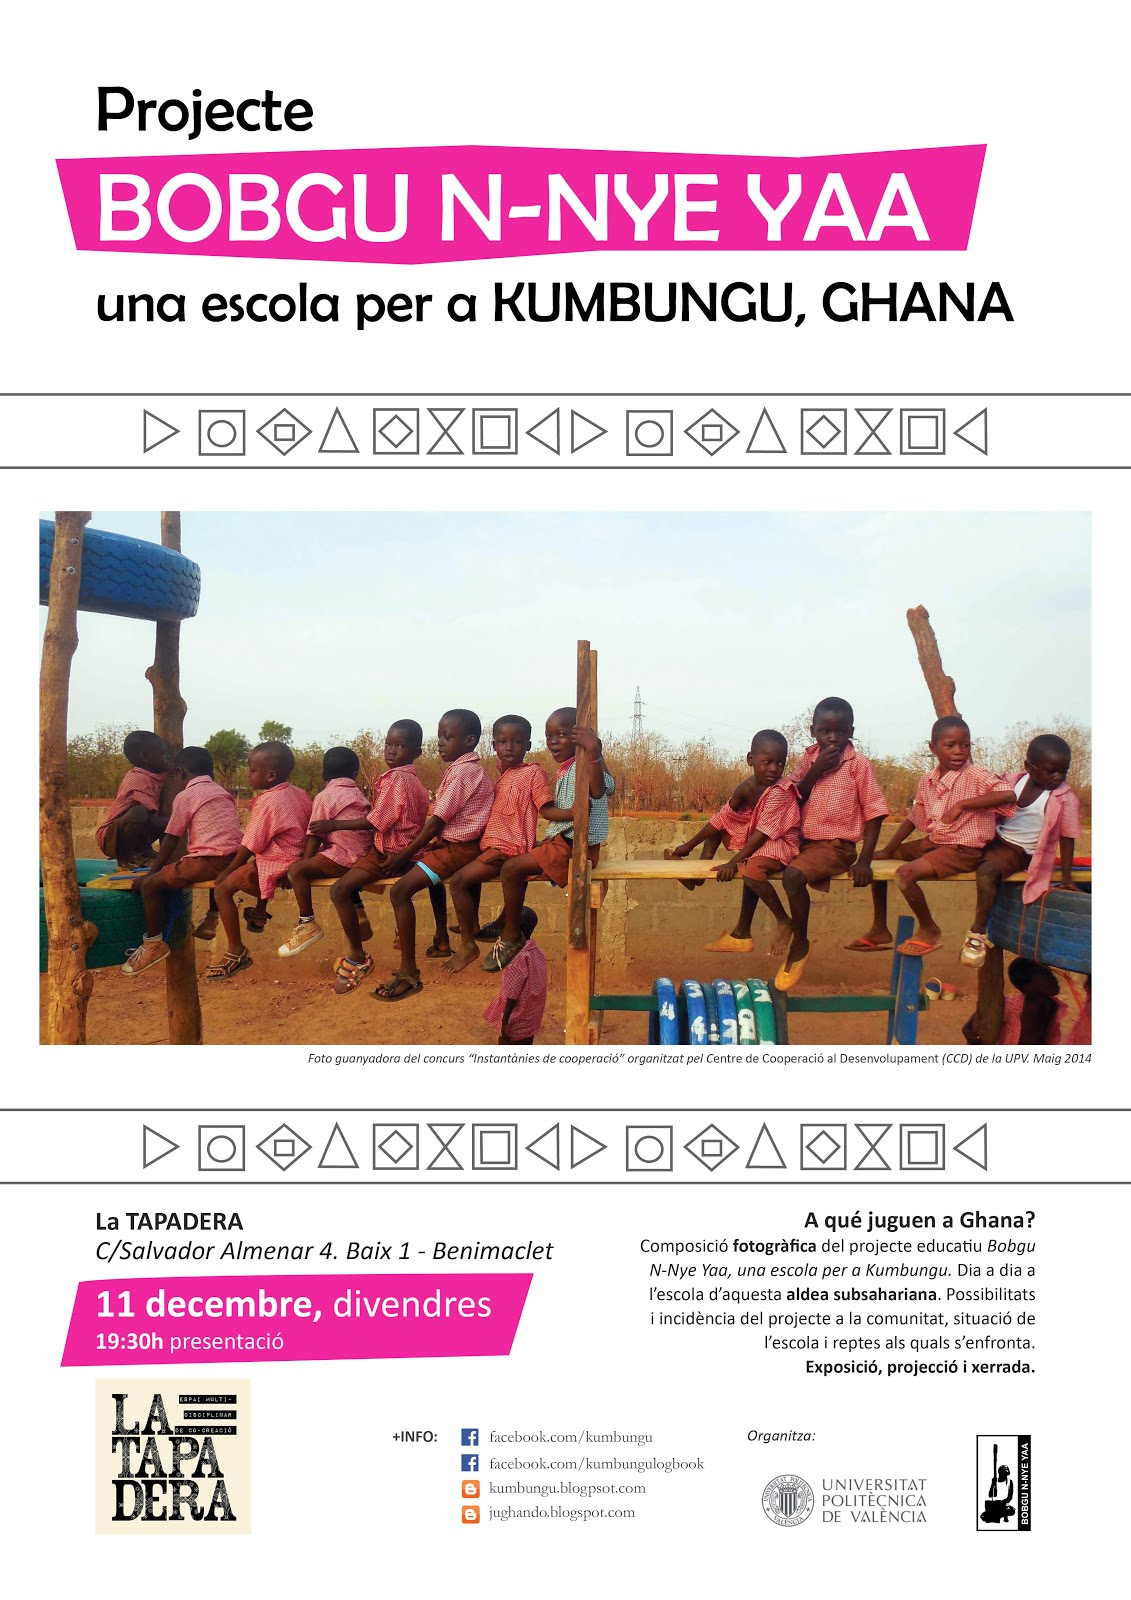 Construyendo un parque infantil en Kumbungu, Ghana